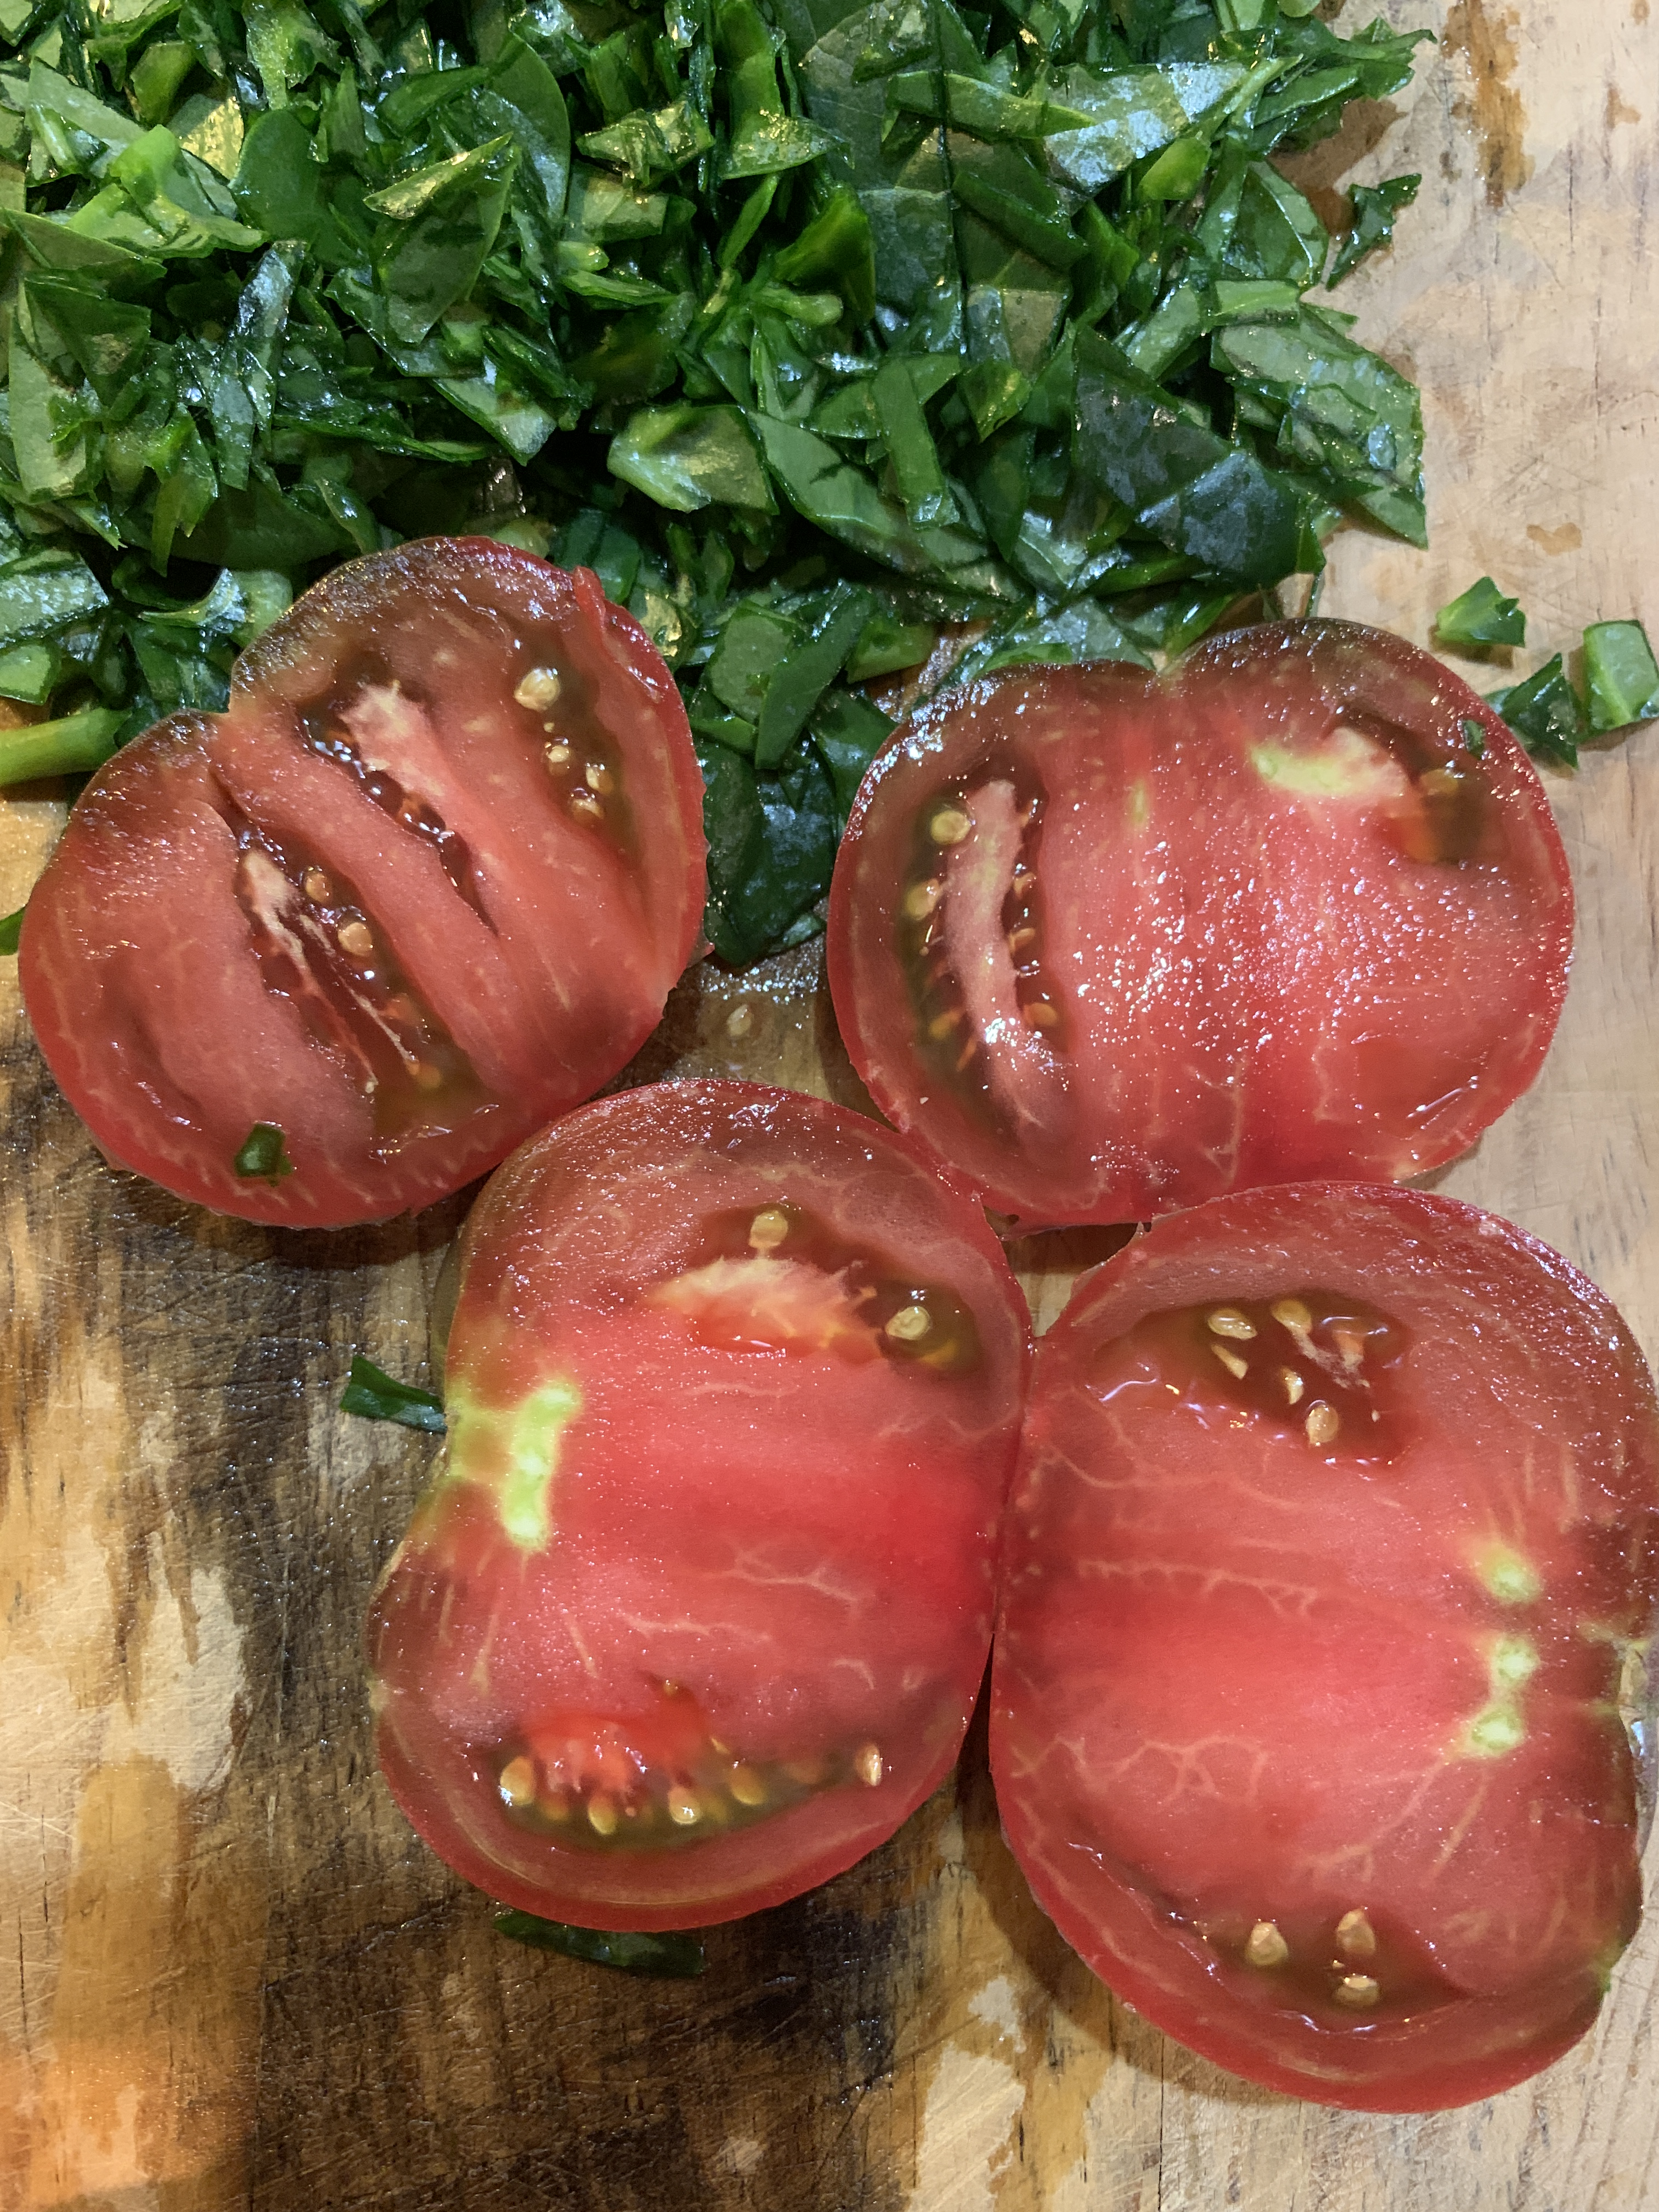 Shindy's Heirloom Tomatoes